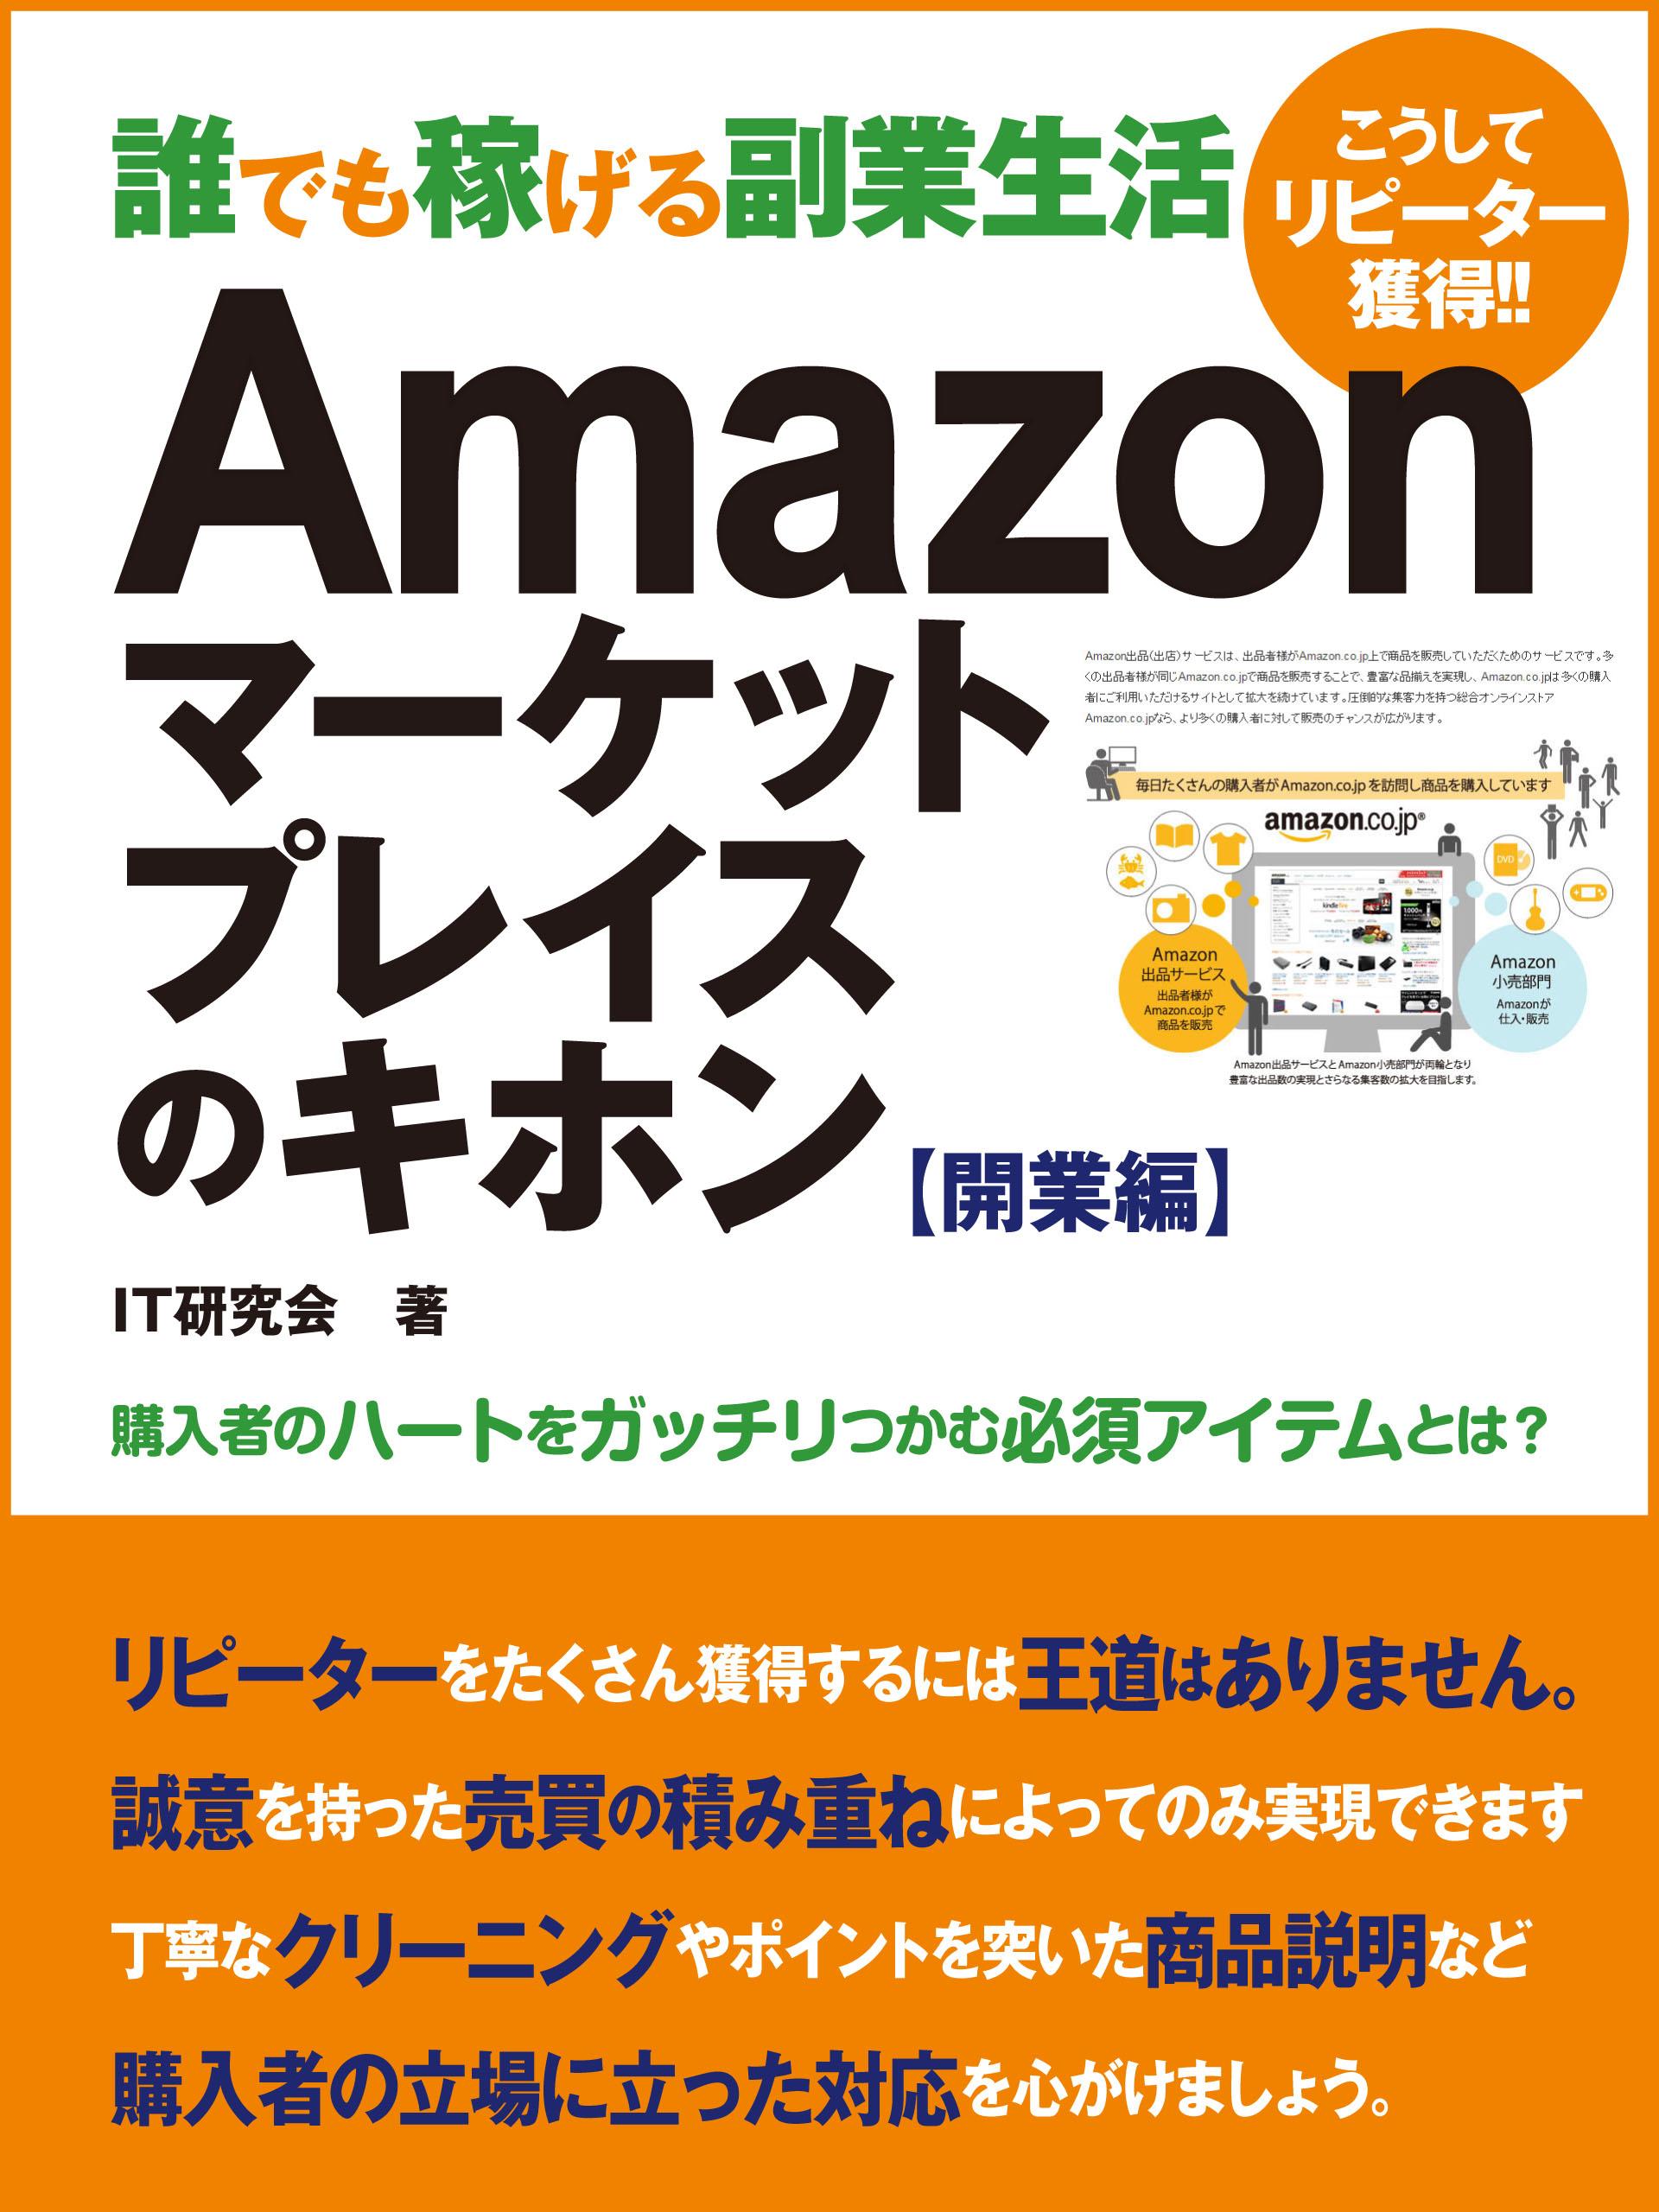 Amazonマーケットプレイスのキホン 開業編